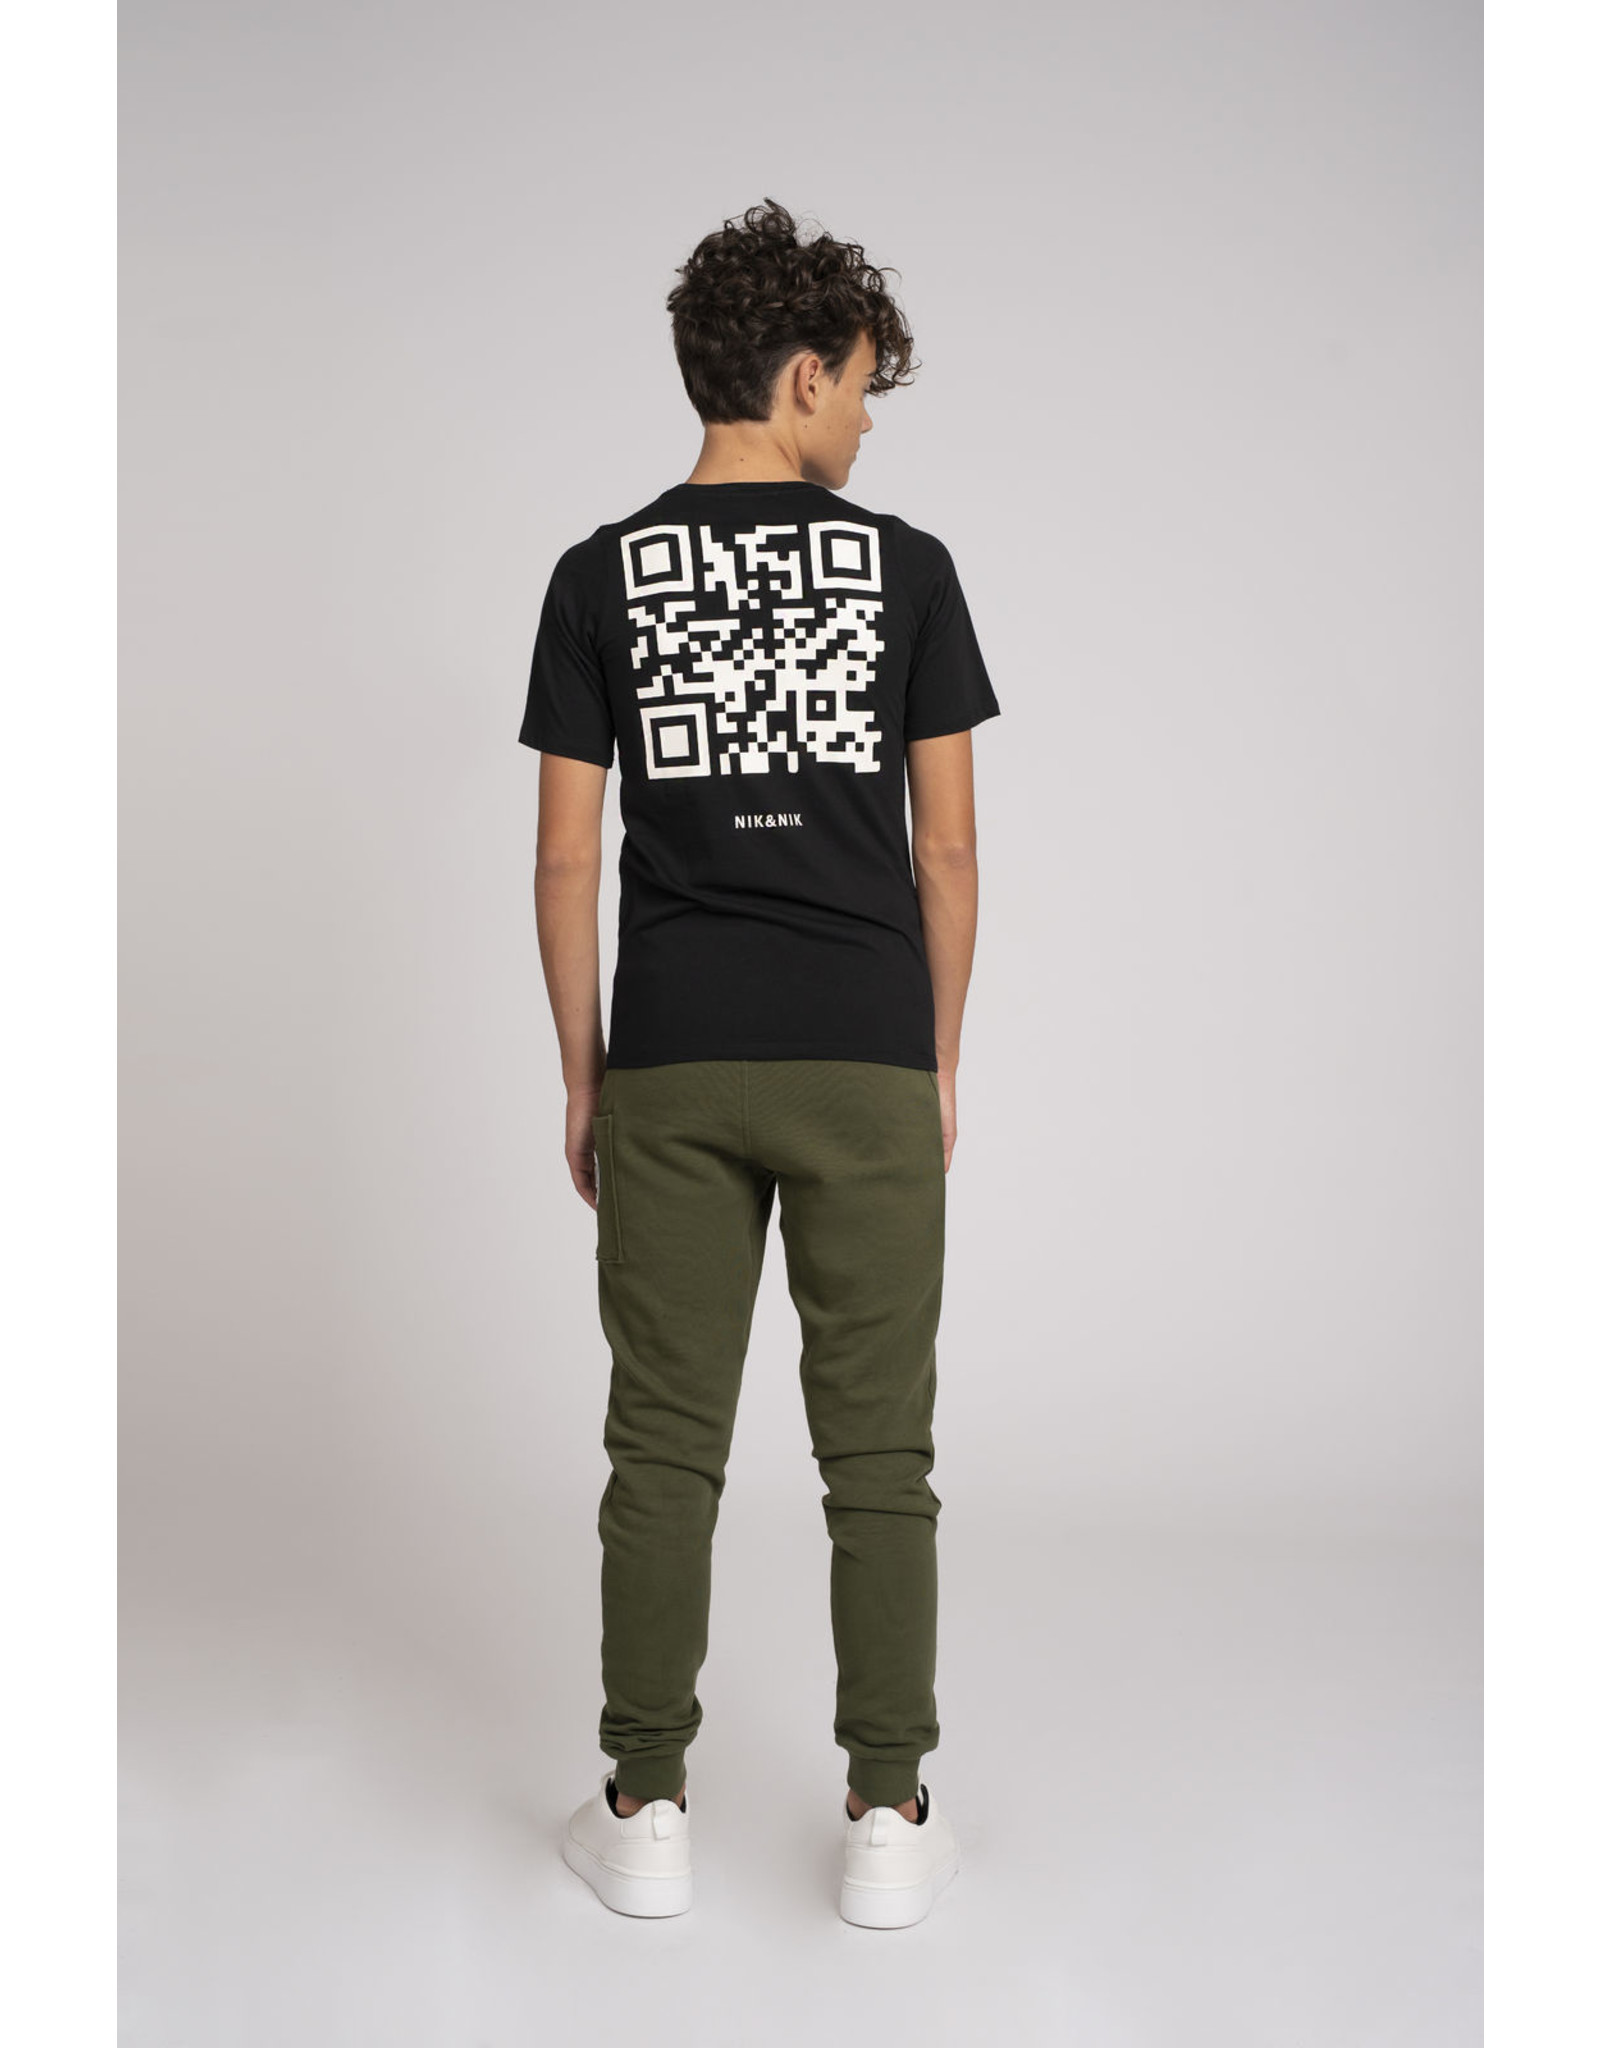 Nik&Nik NIK&NIK Marnix T-shirt Black